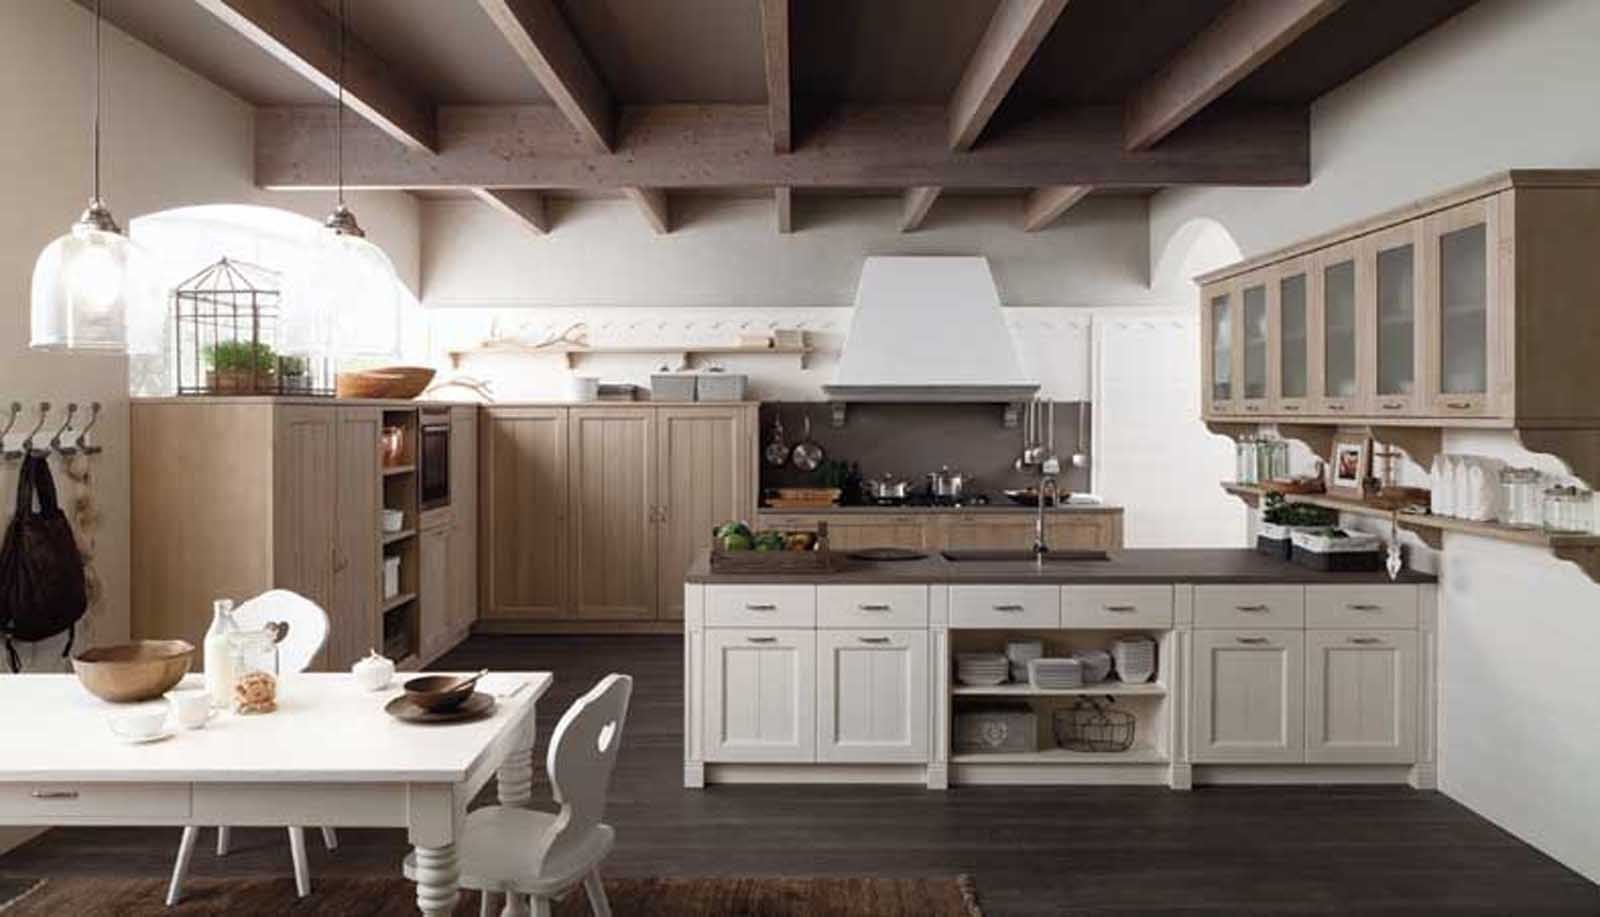 Cucine Country Una Scelta Di Stile Cose Di Casa #505C31 1600 917 Foto Di Cucine Arte Povera